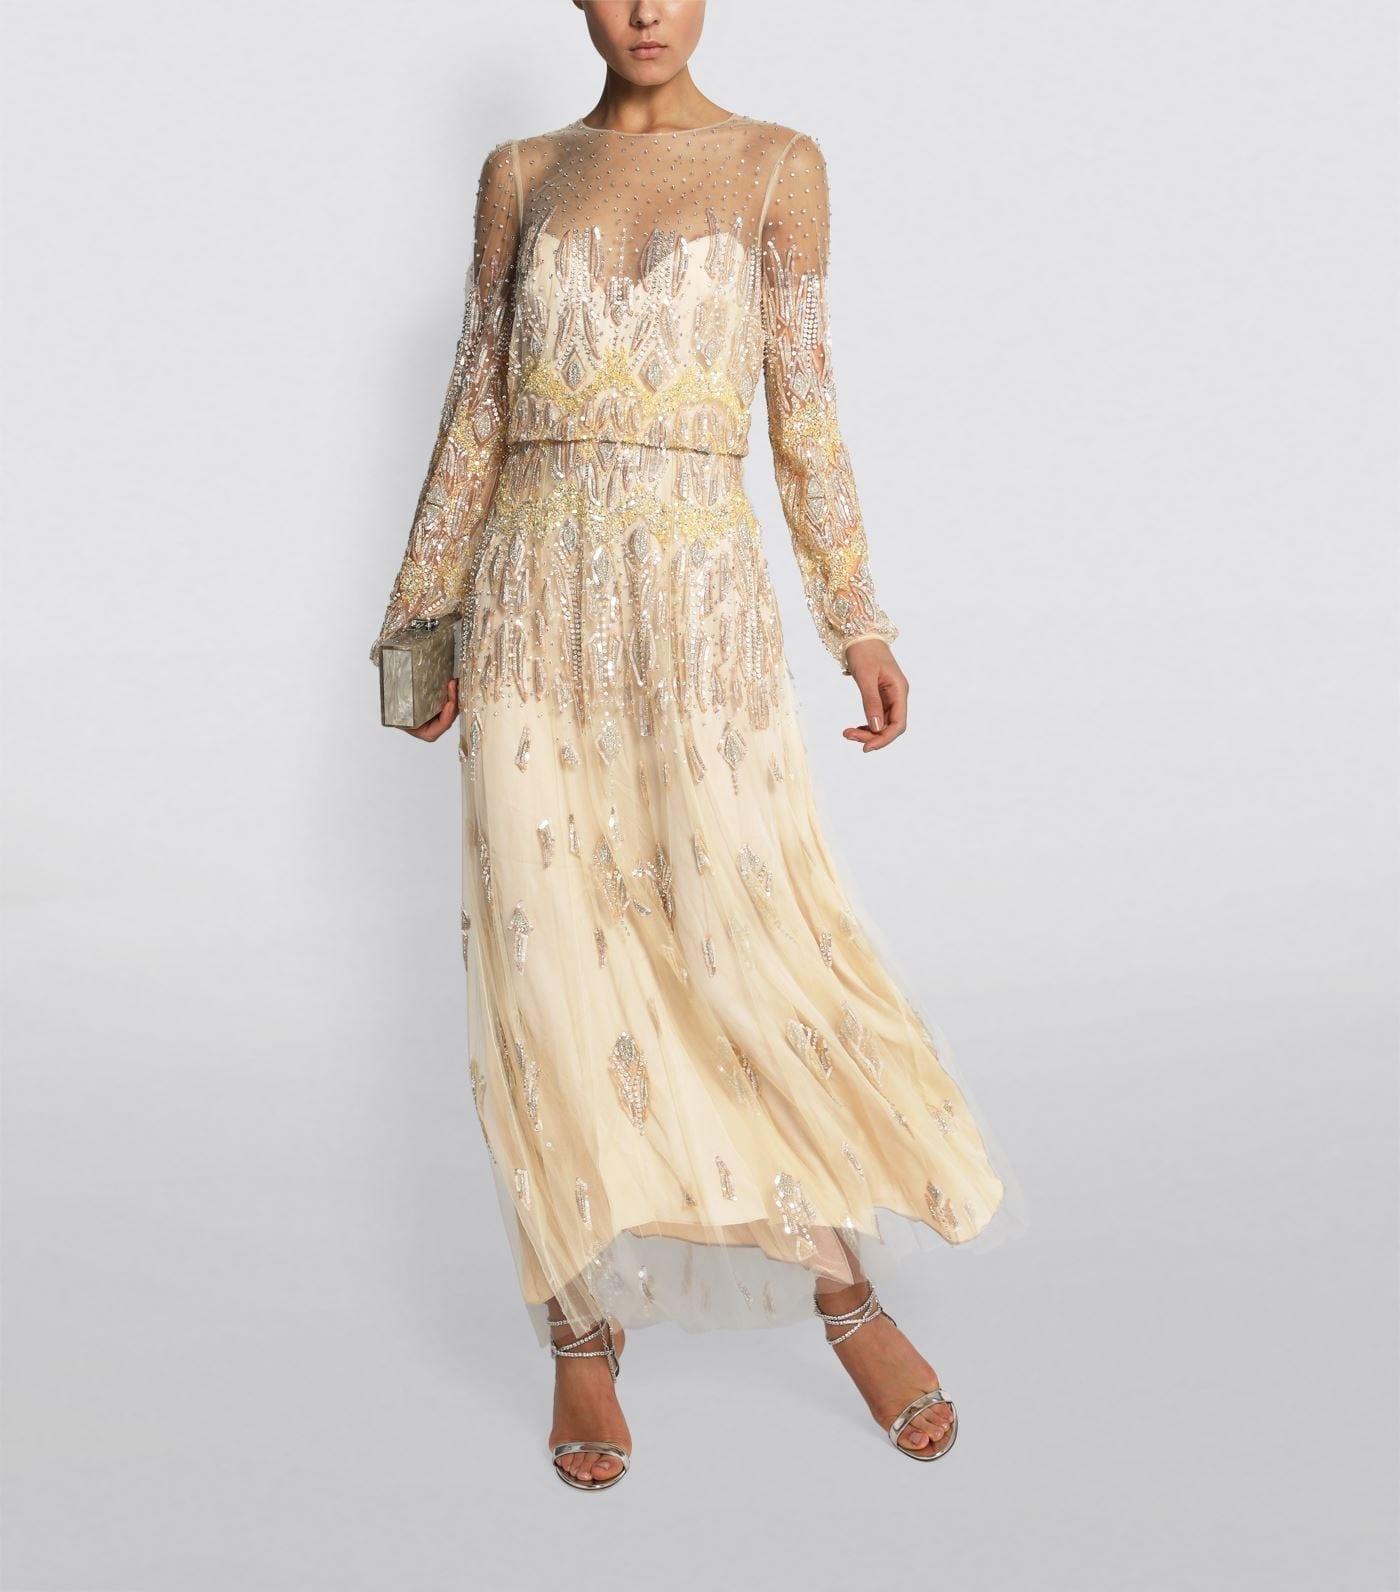 MONIQUE LHUILLIER Beaded Tulle Midi Dress